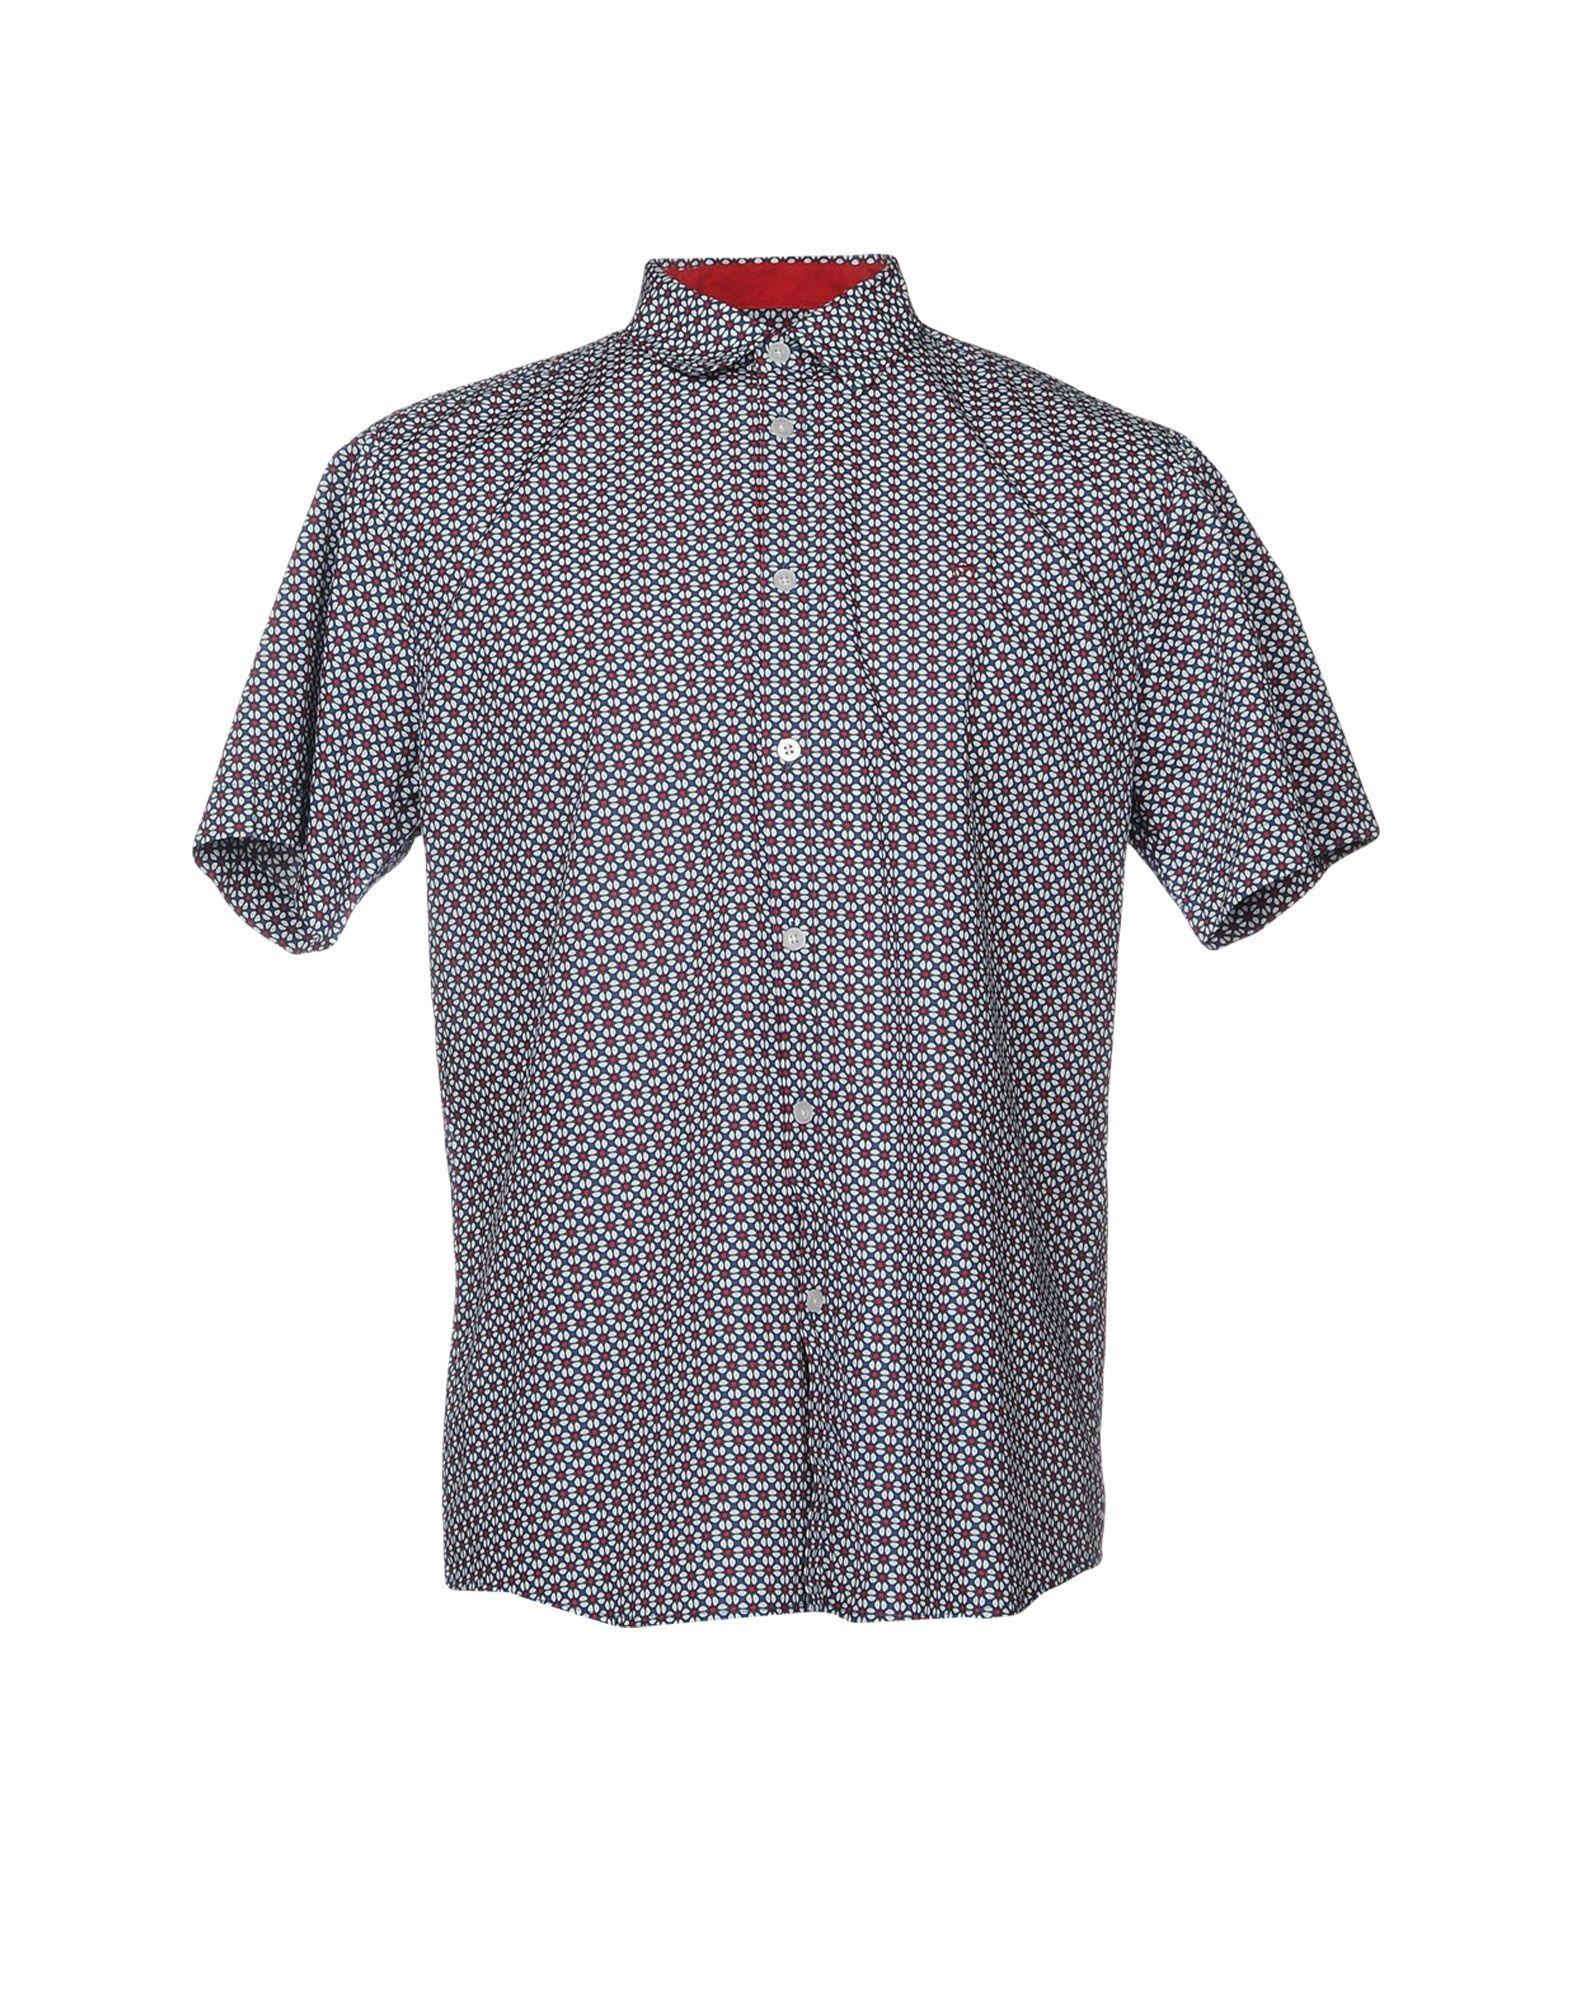 MERC Pубашка merc london рубашка misson синий